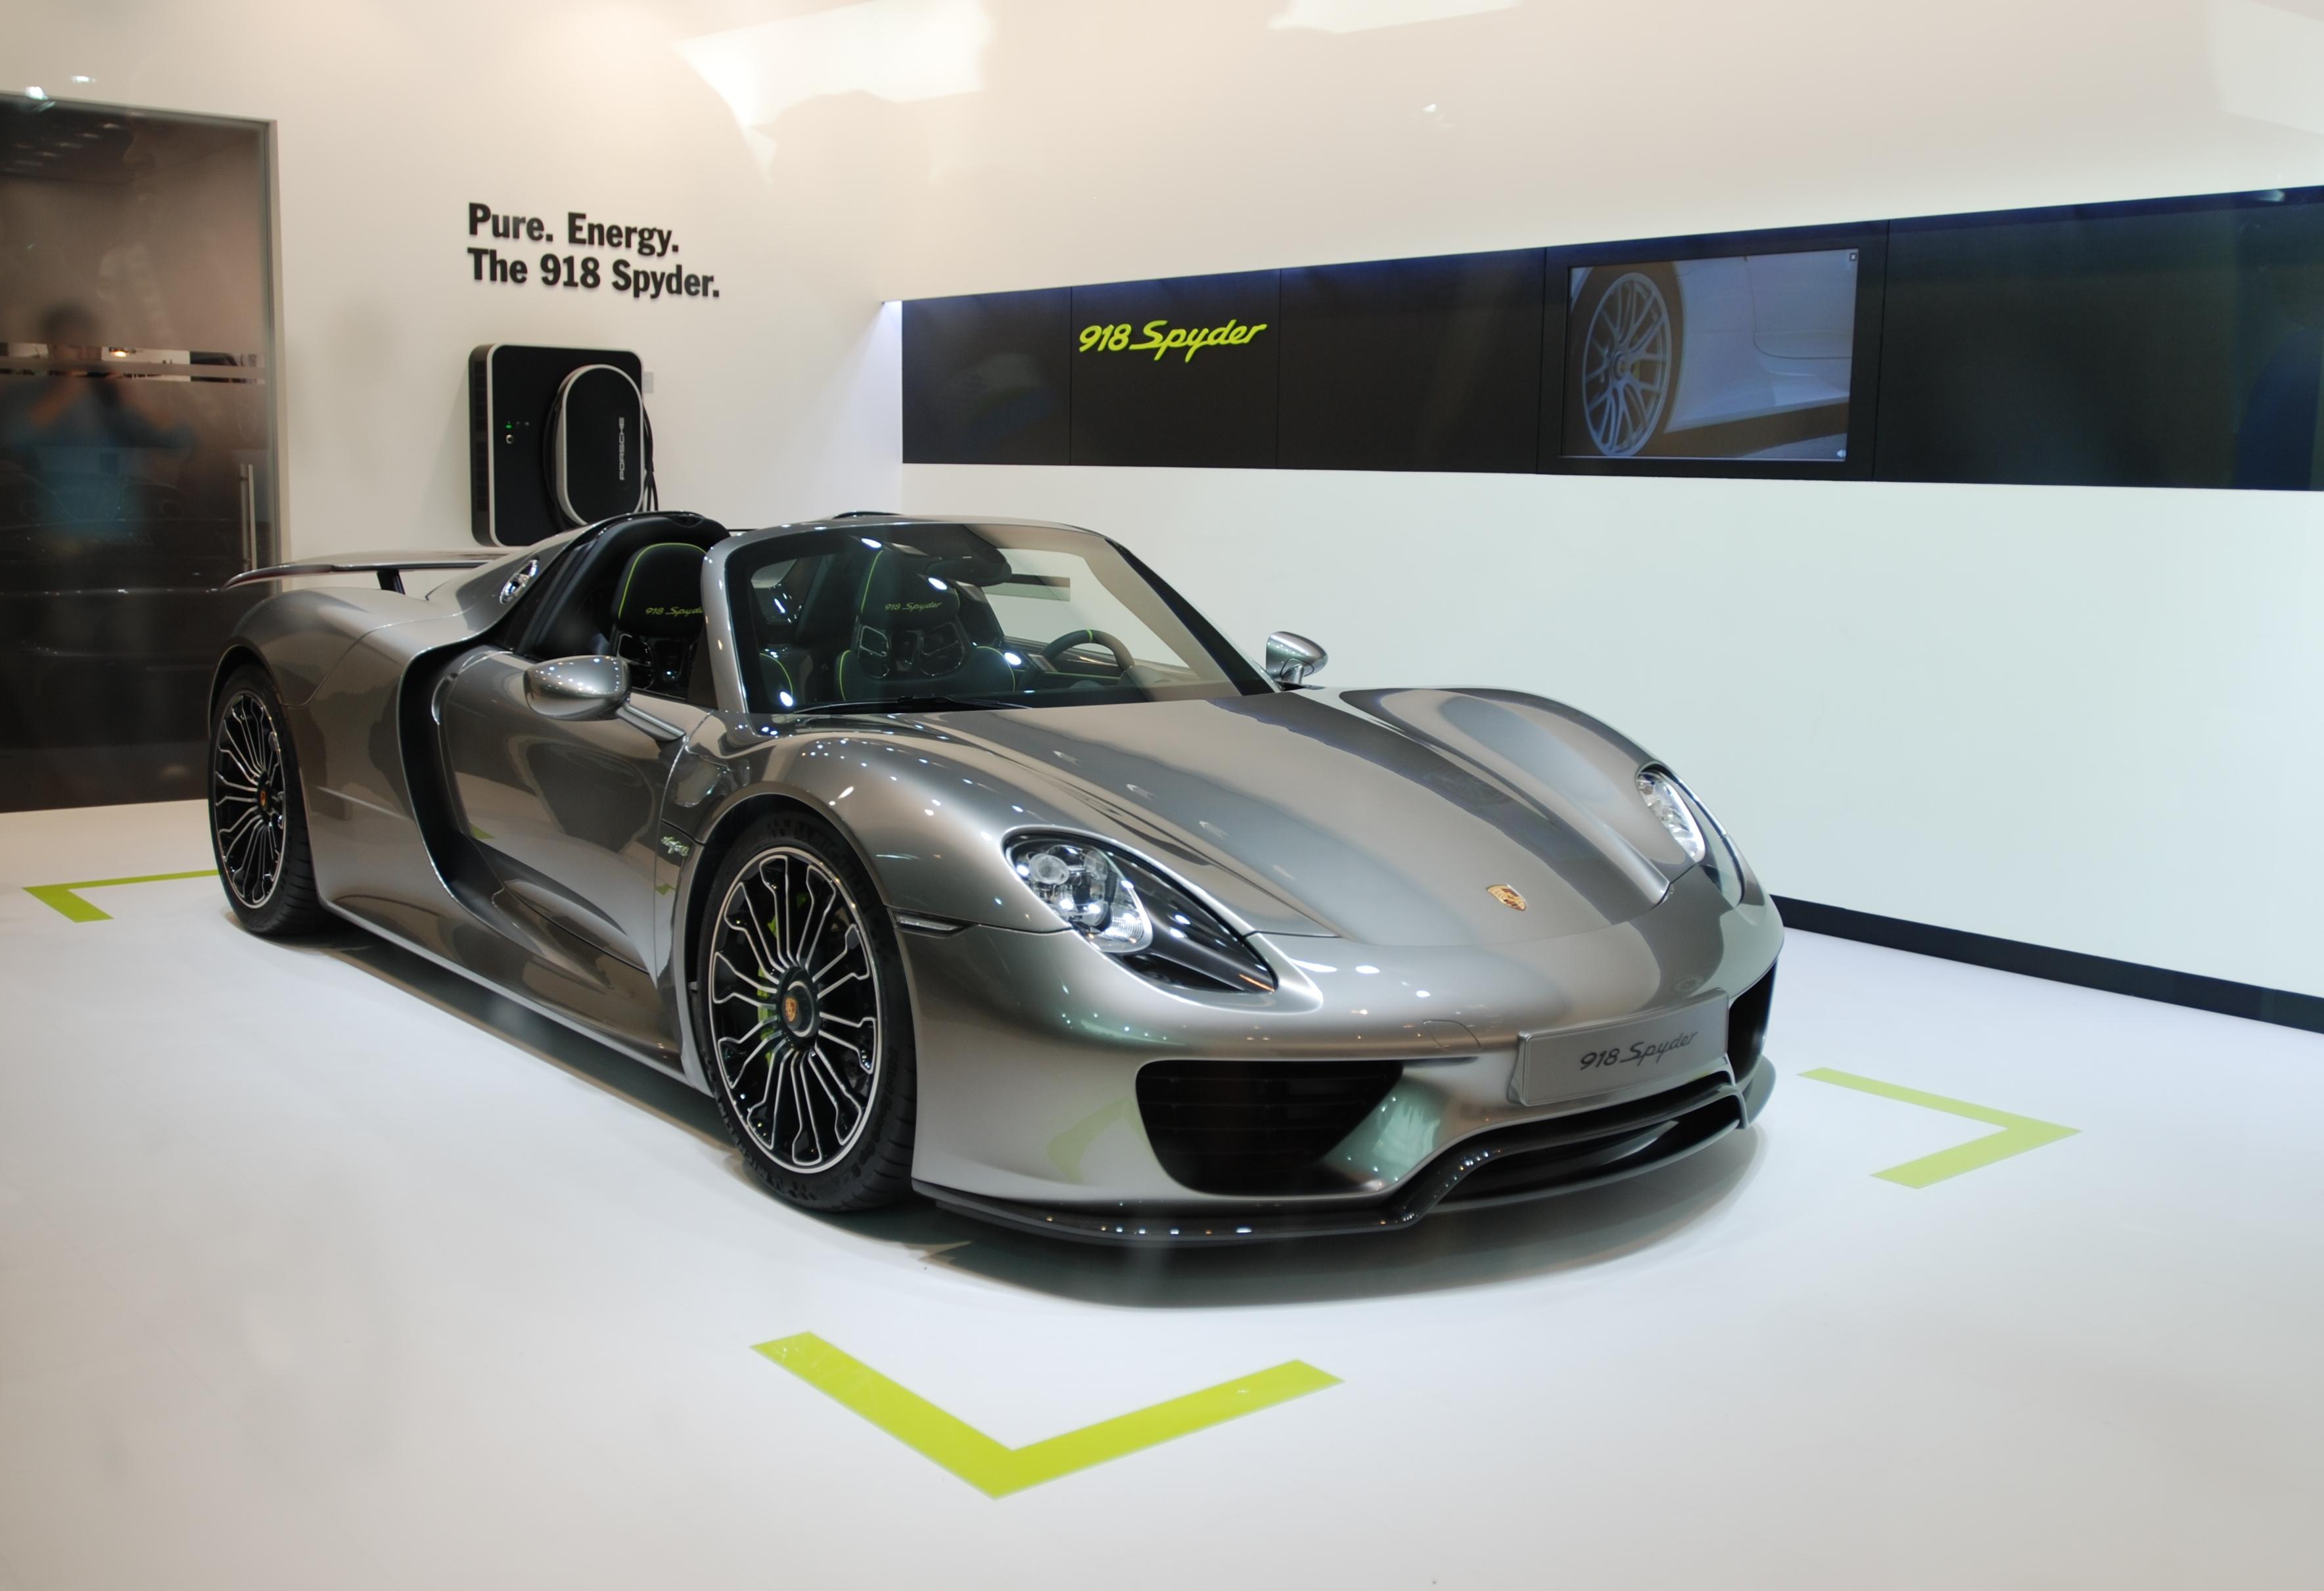 dsc_0347-version-21 Elegant Porsche 918 Spyder Los Angeles Cars Trend